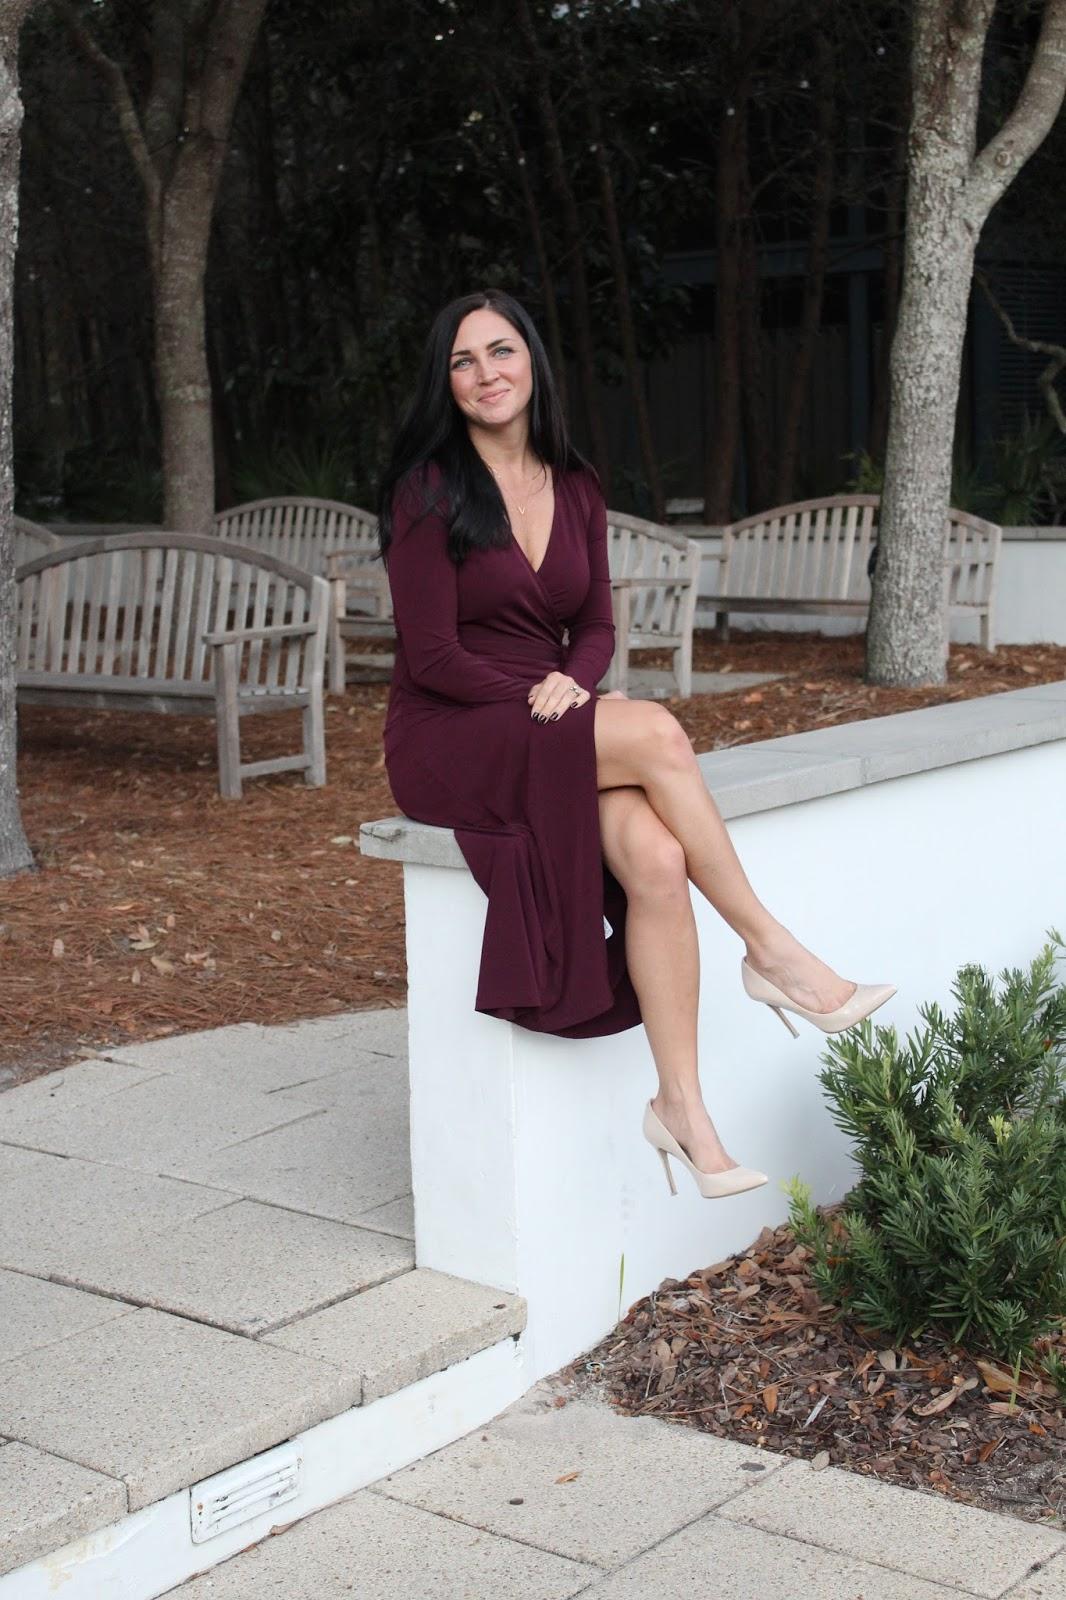 Nude Heels, Burgundy Dress, Christmas Party Outfit, Seaside, FL